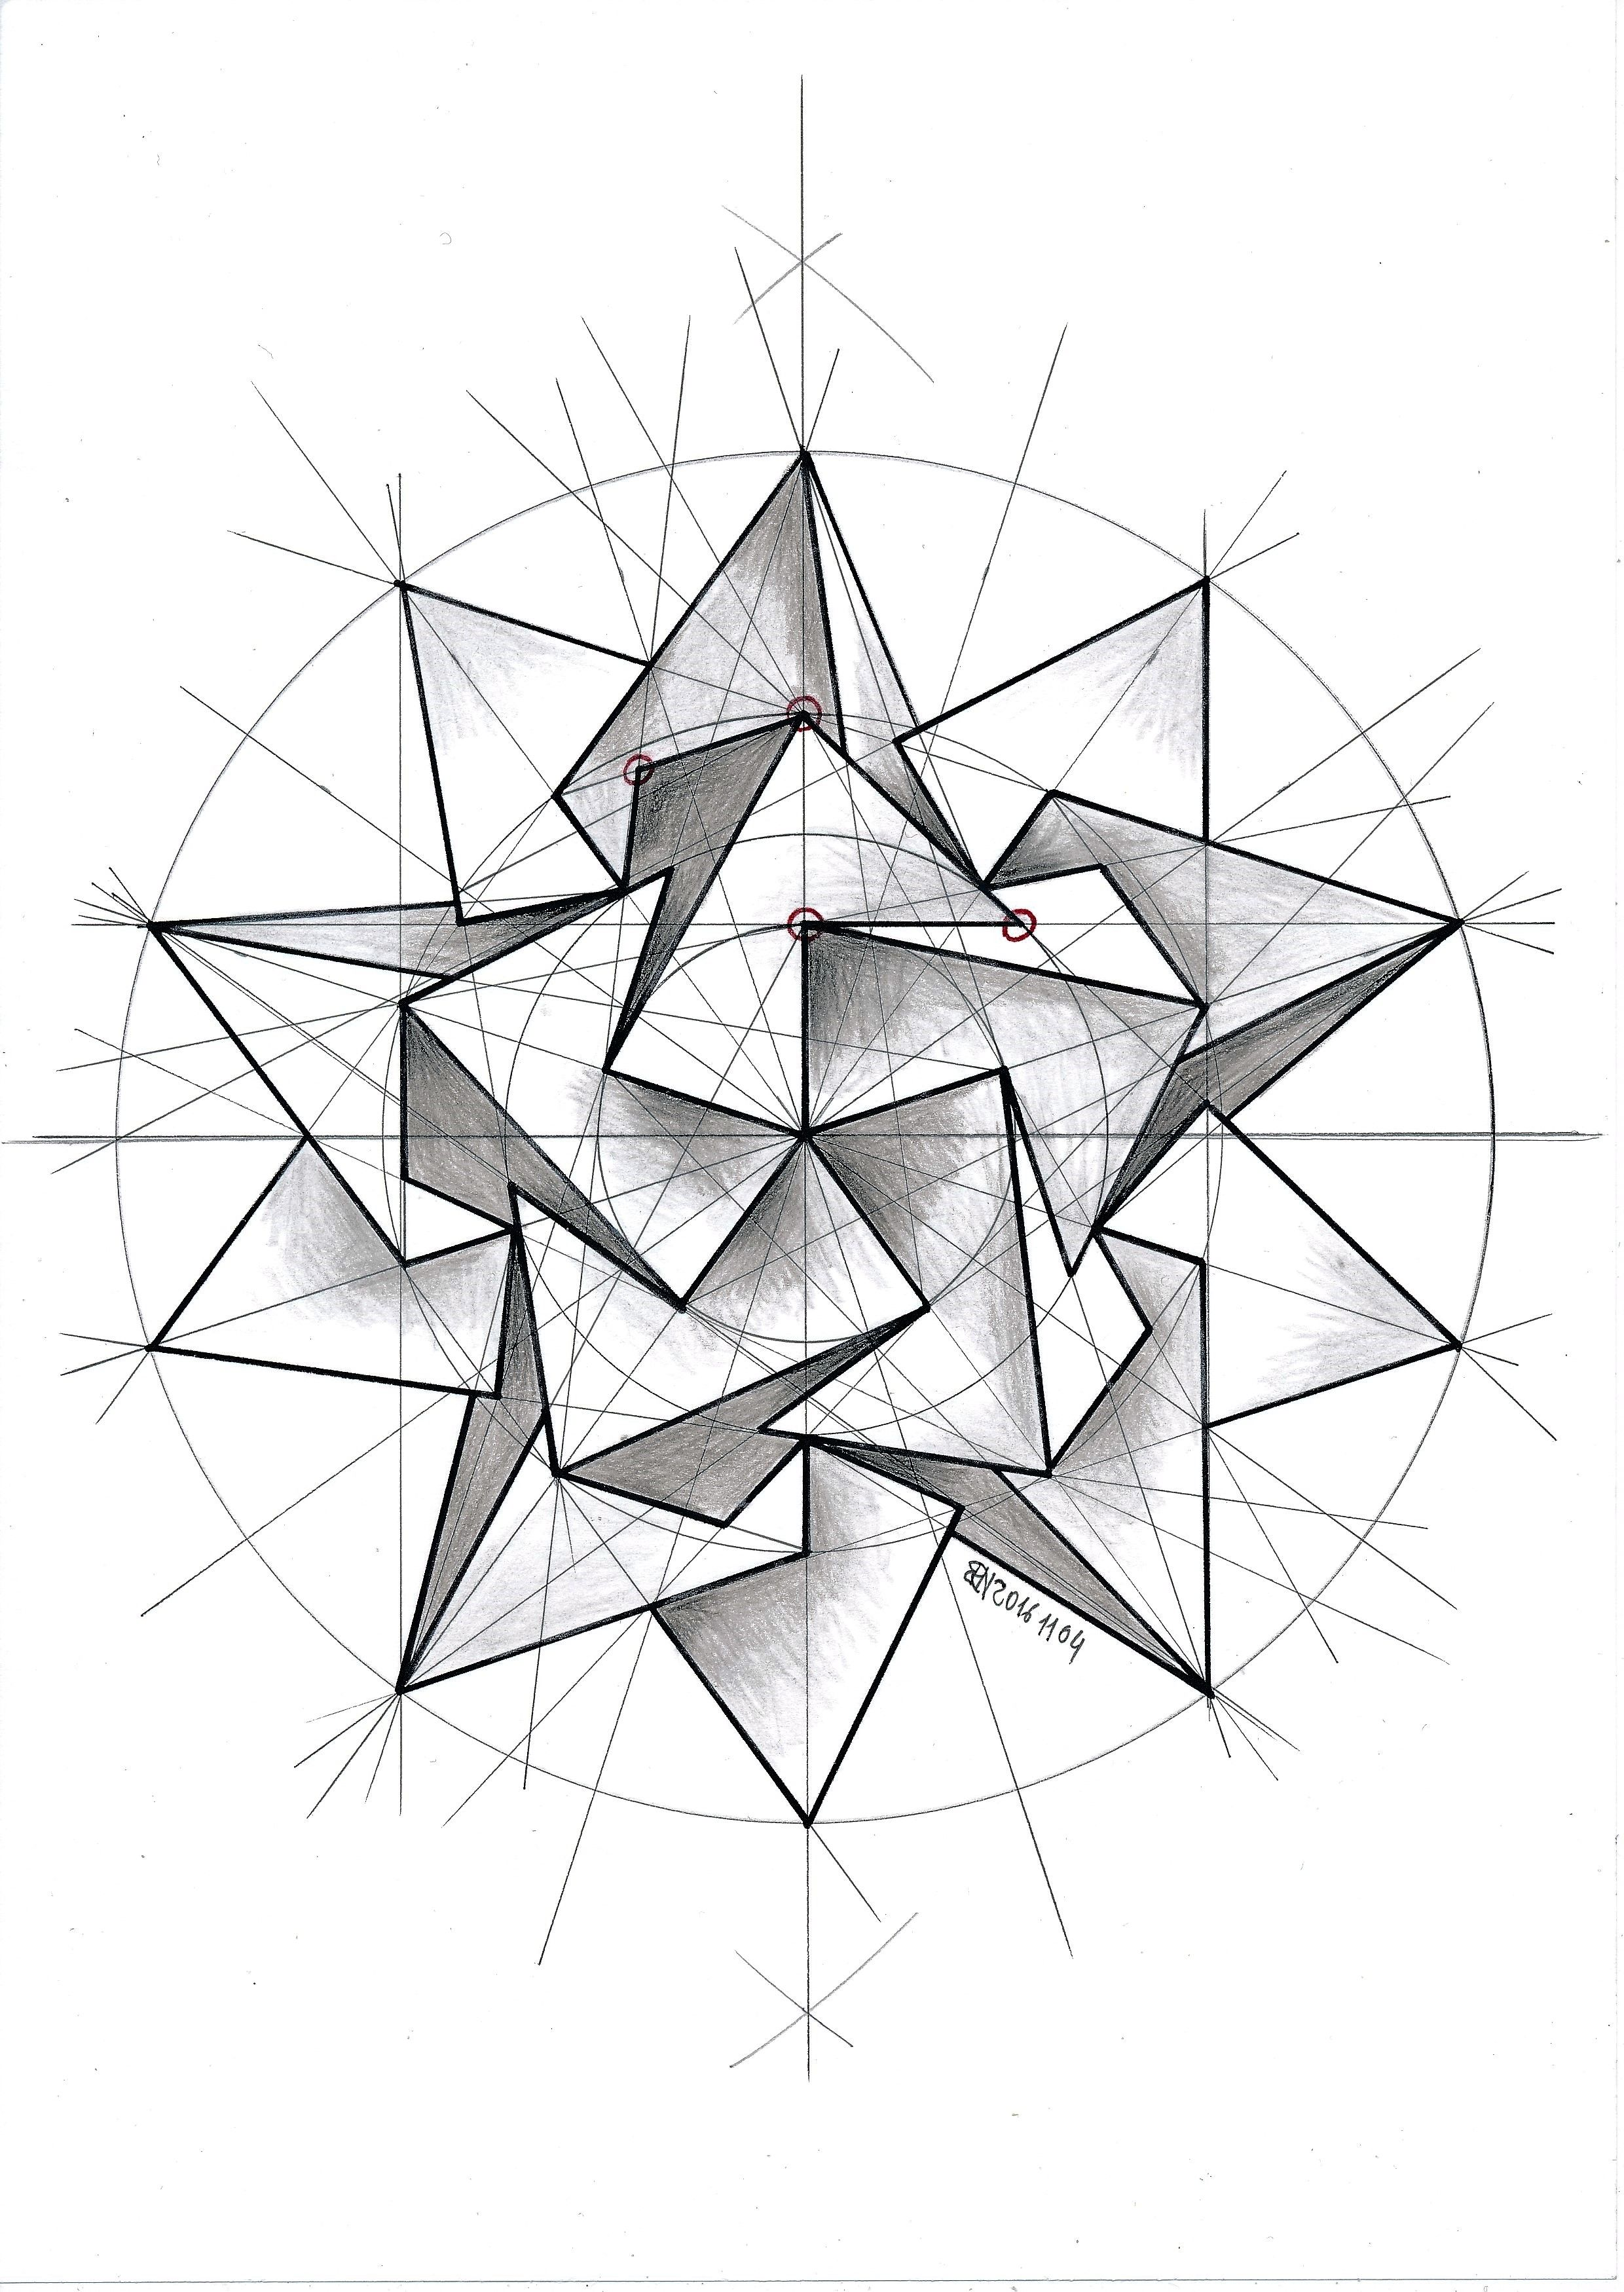 #polyhedra #solid #geometry #symmetry #pattern #handmade #